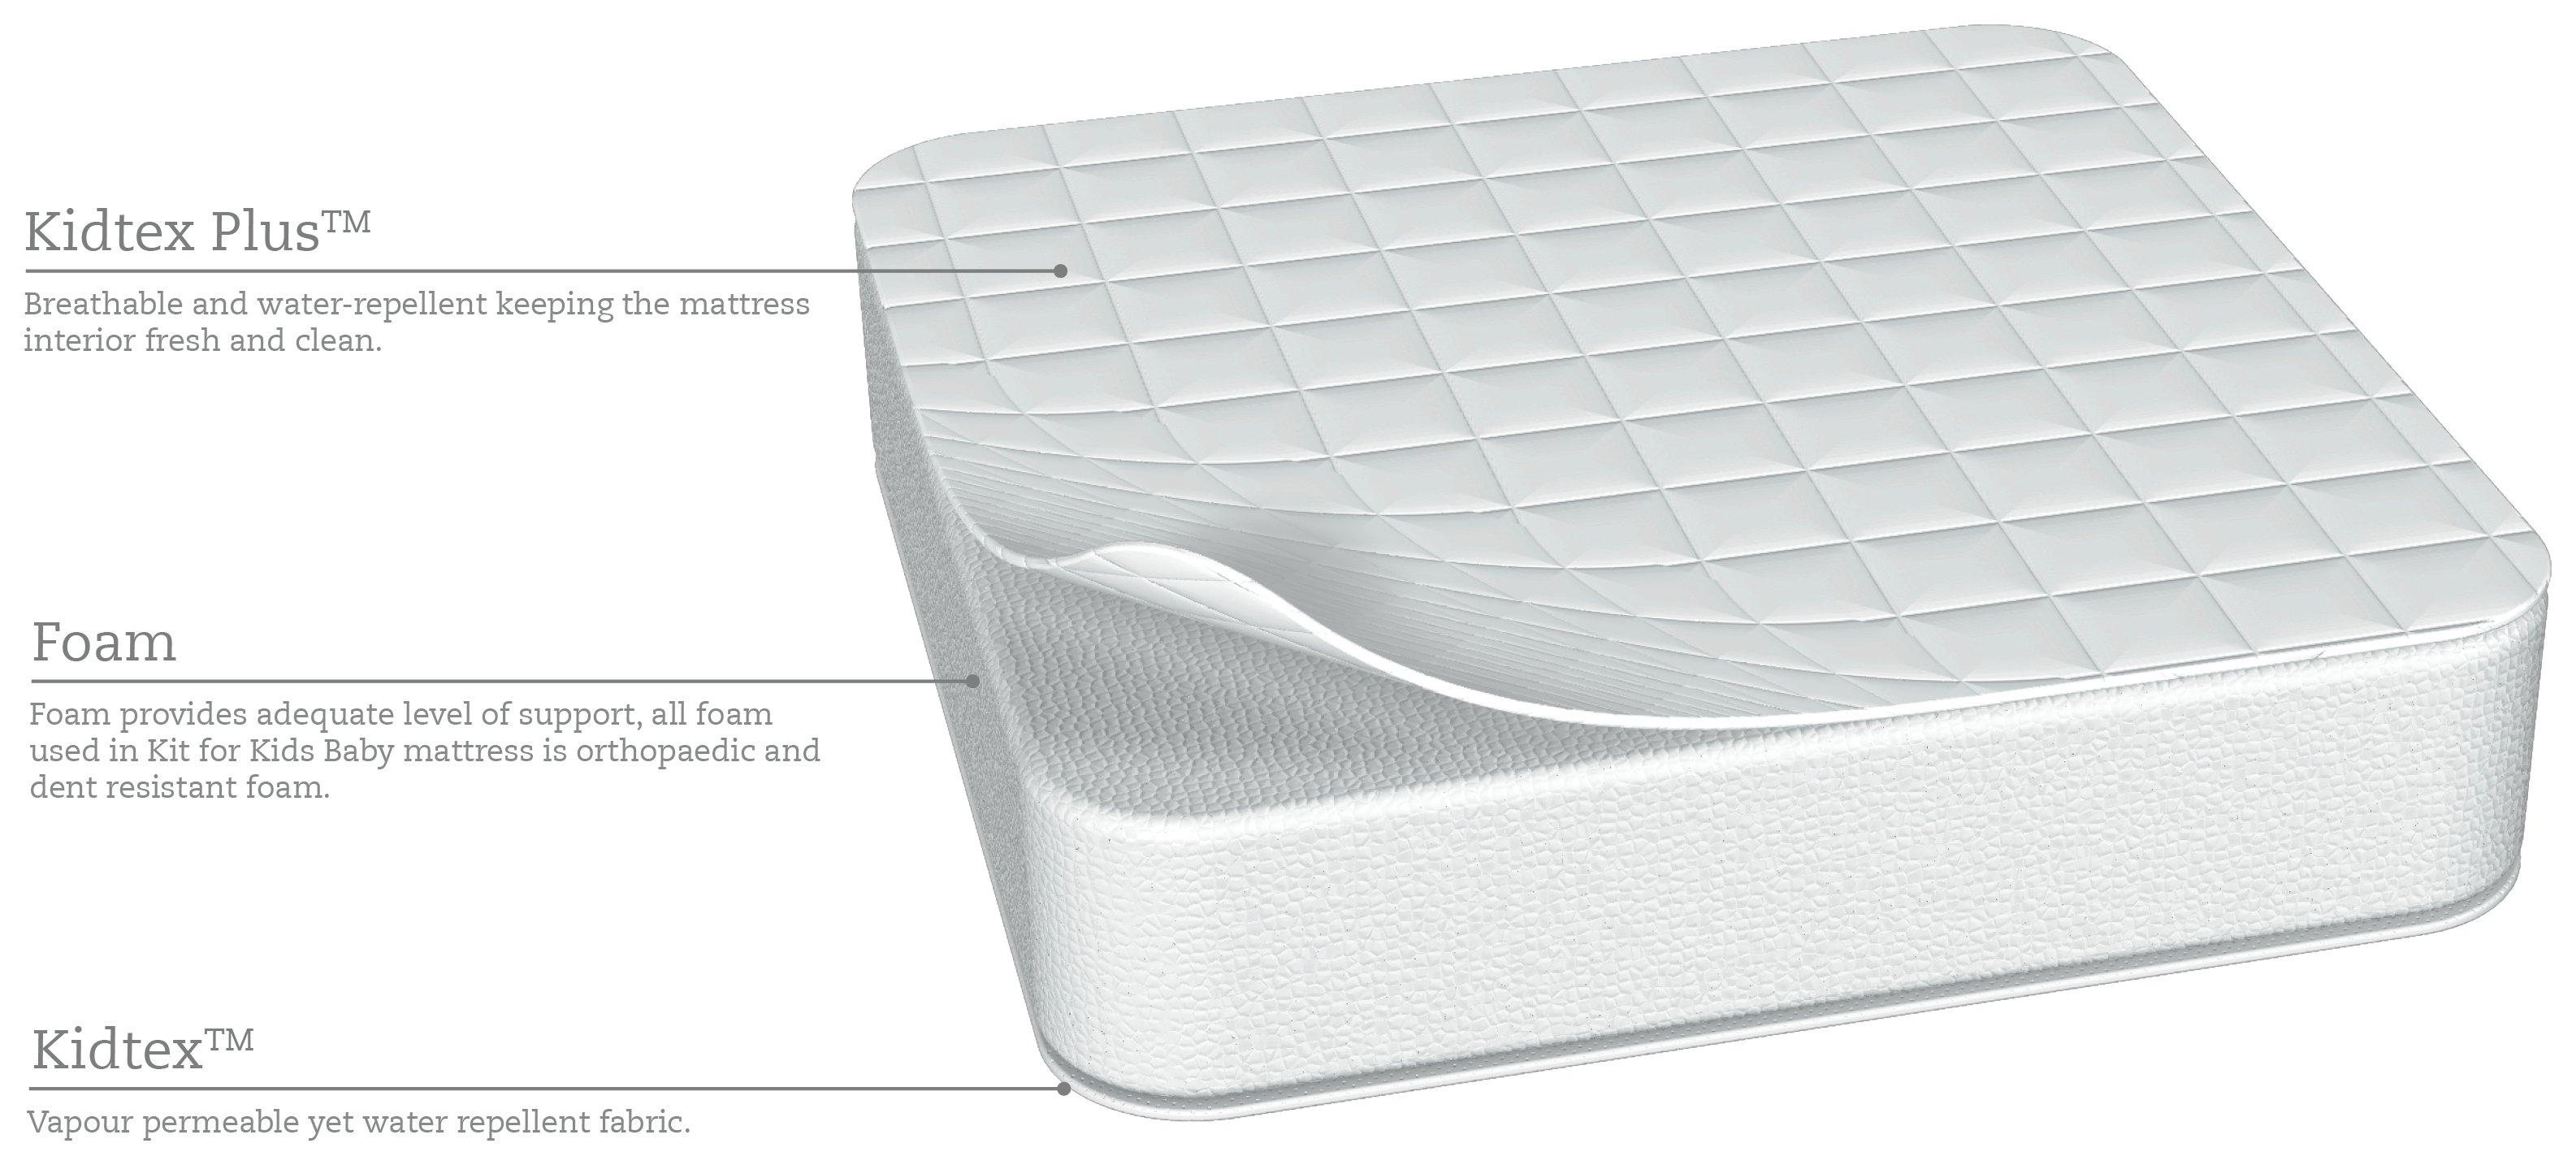 kit for kids kidtex thick travel cot mattress